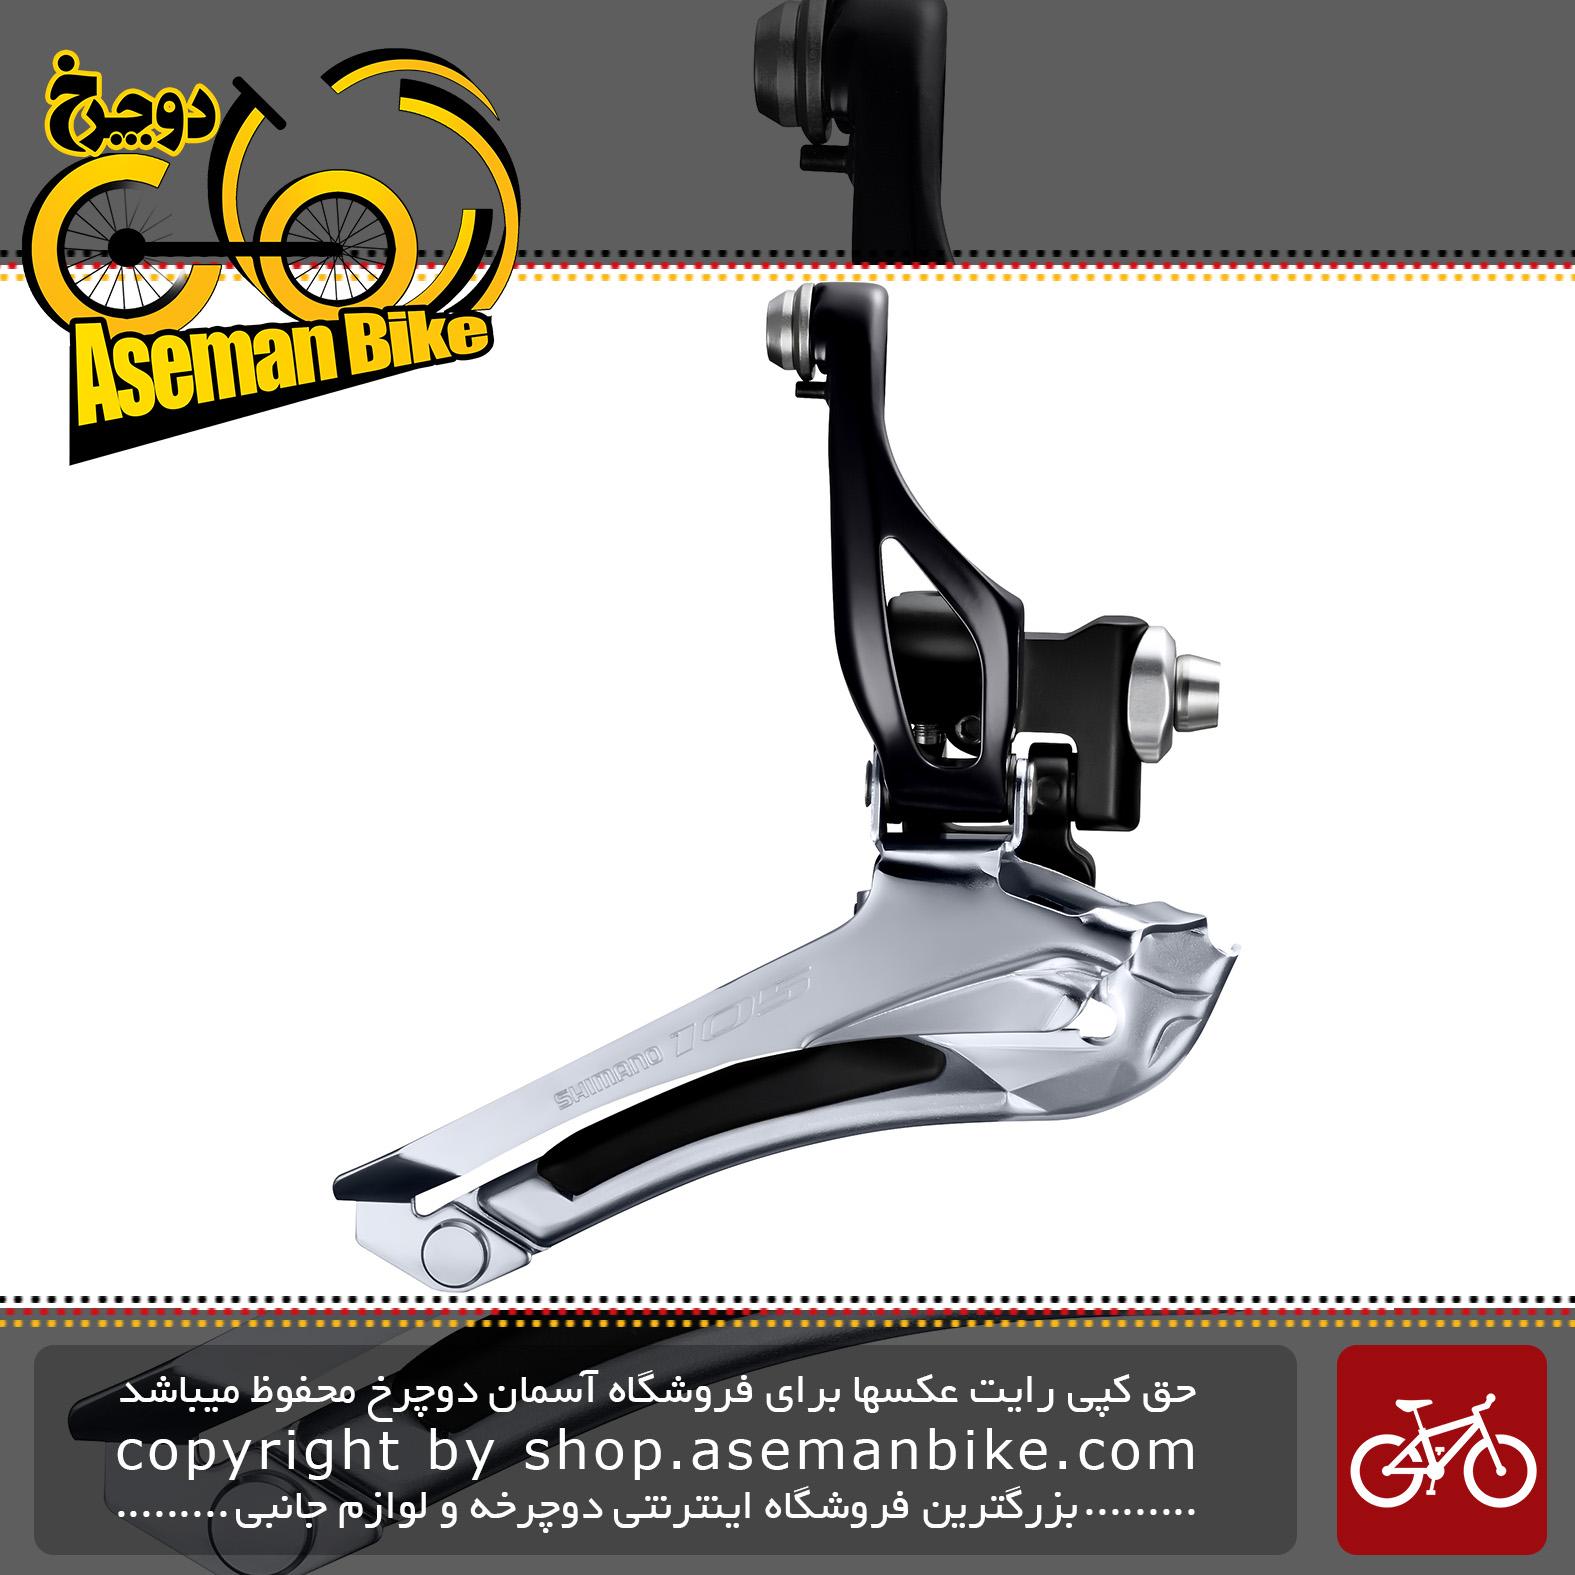 طبق عوض کن دوچرخه شیمانو 105 Shimano 105 FD-5800 Front Derailleur (2x11-speed) Brazed-On